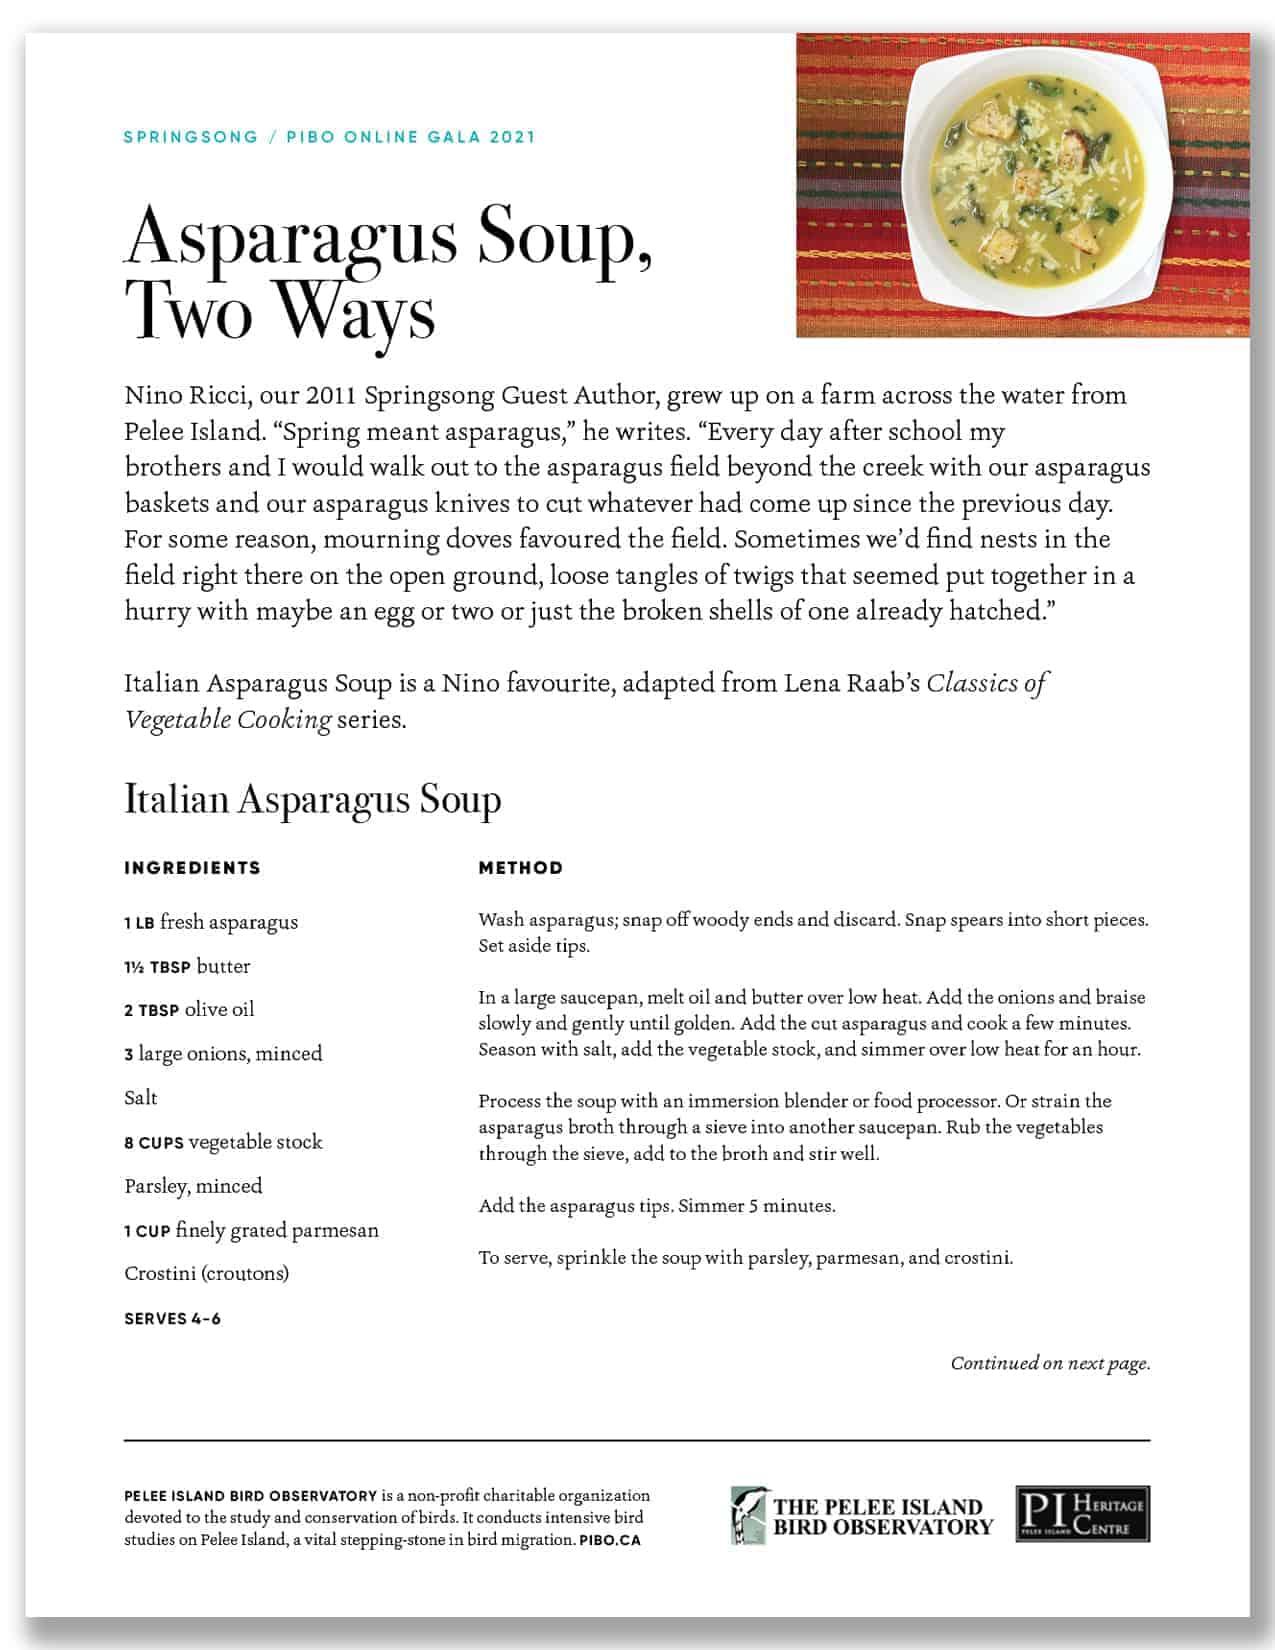 Asparagus Soup Two Ways